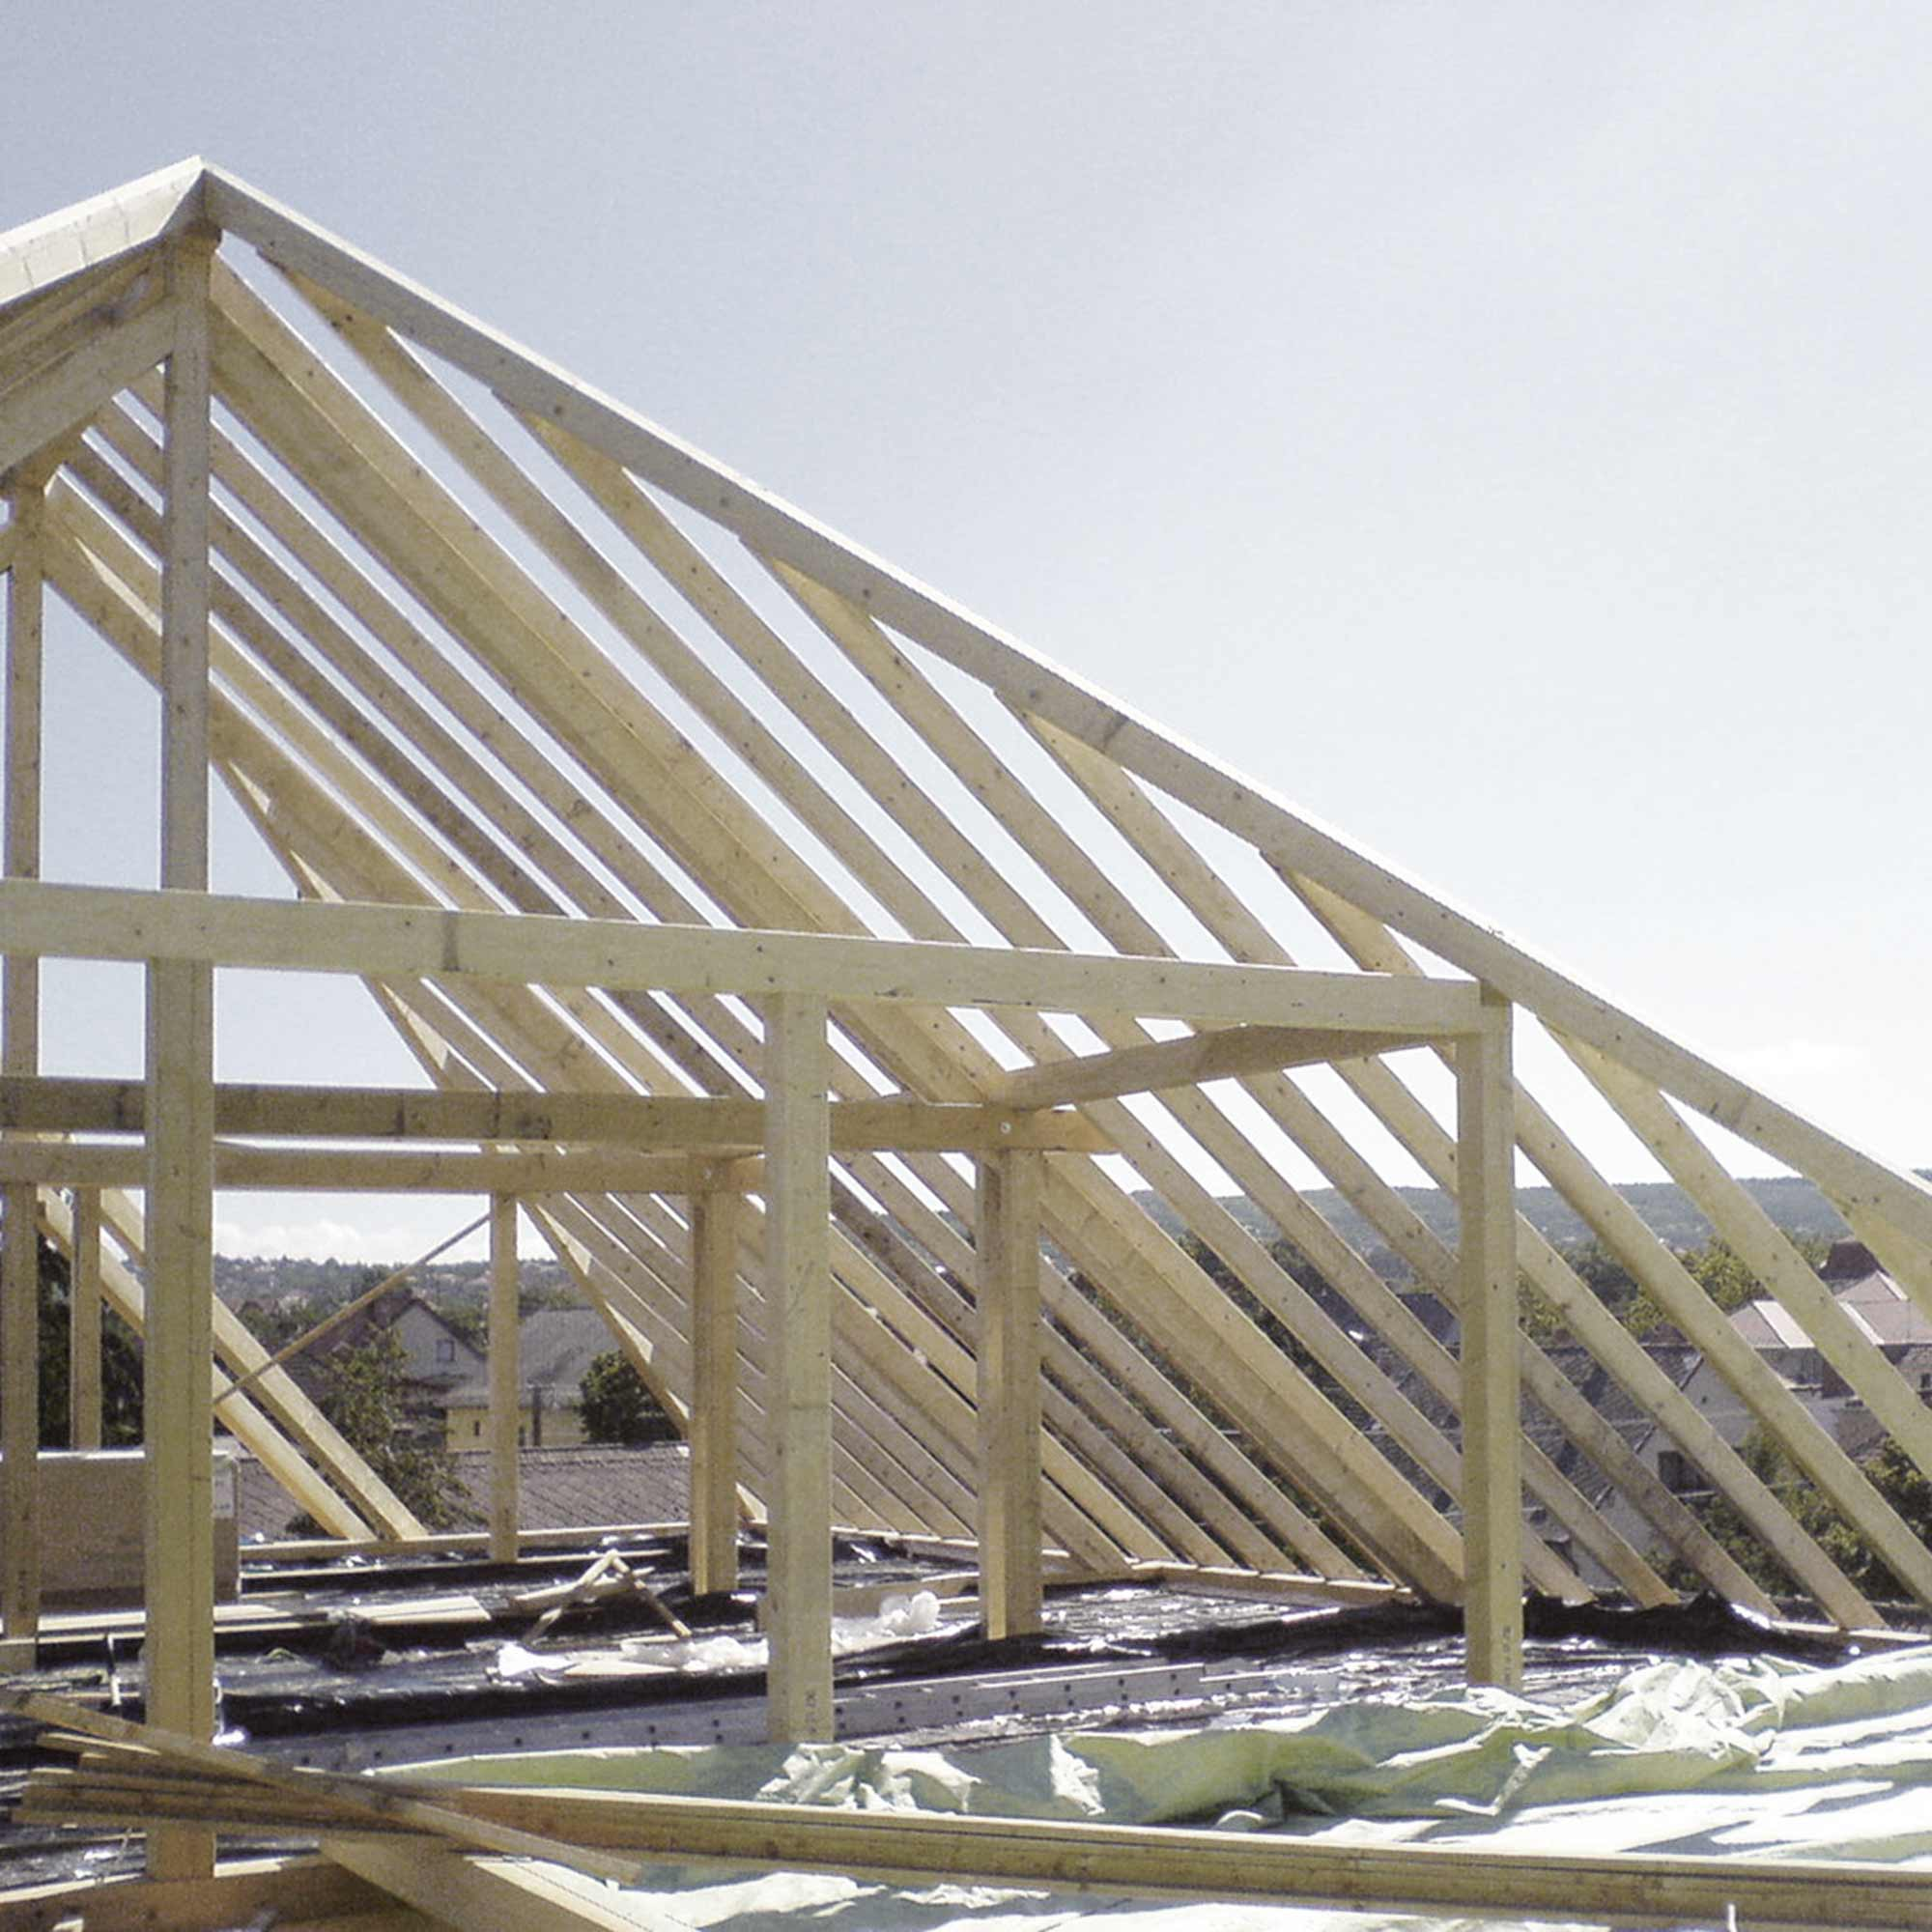 KVH für den Dachstuhl – HolzLand Verbeek